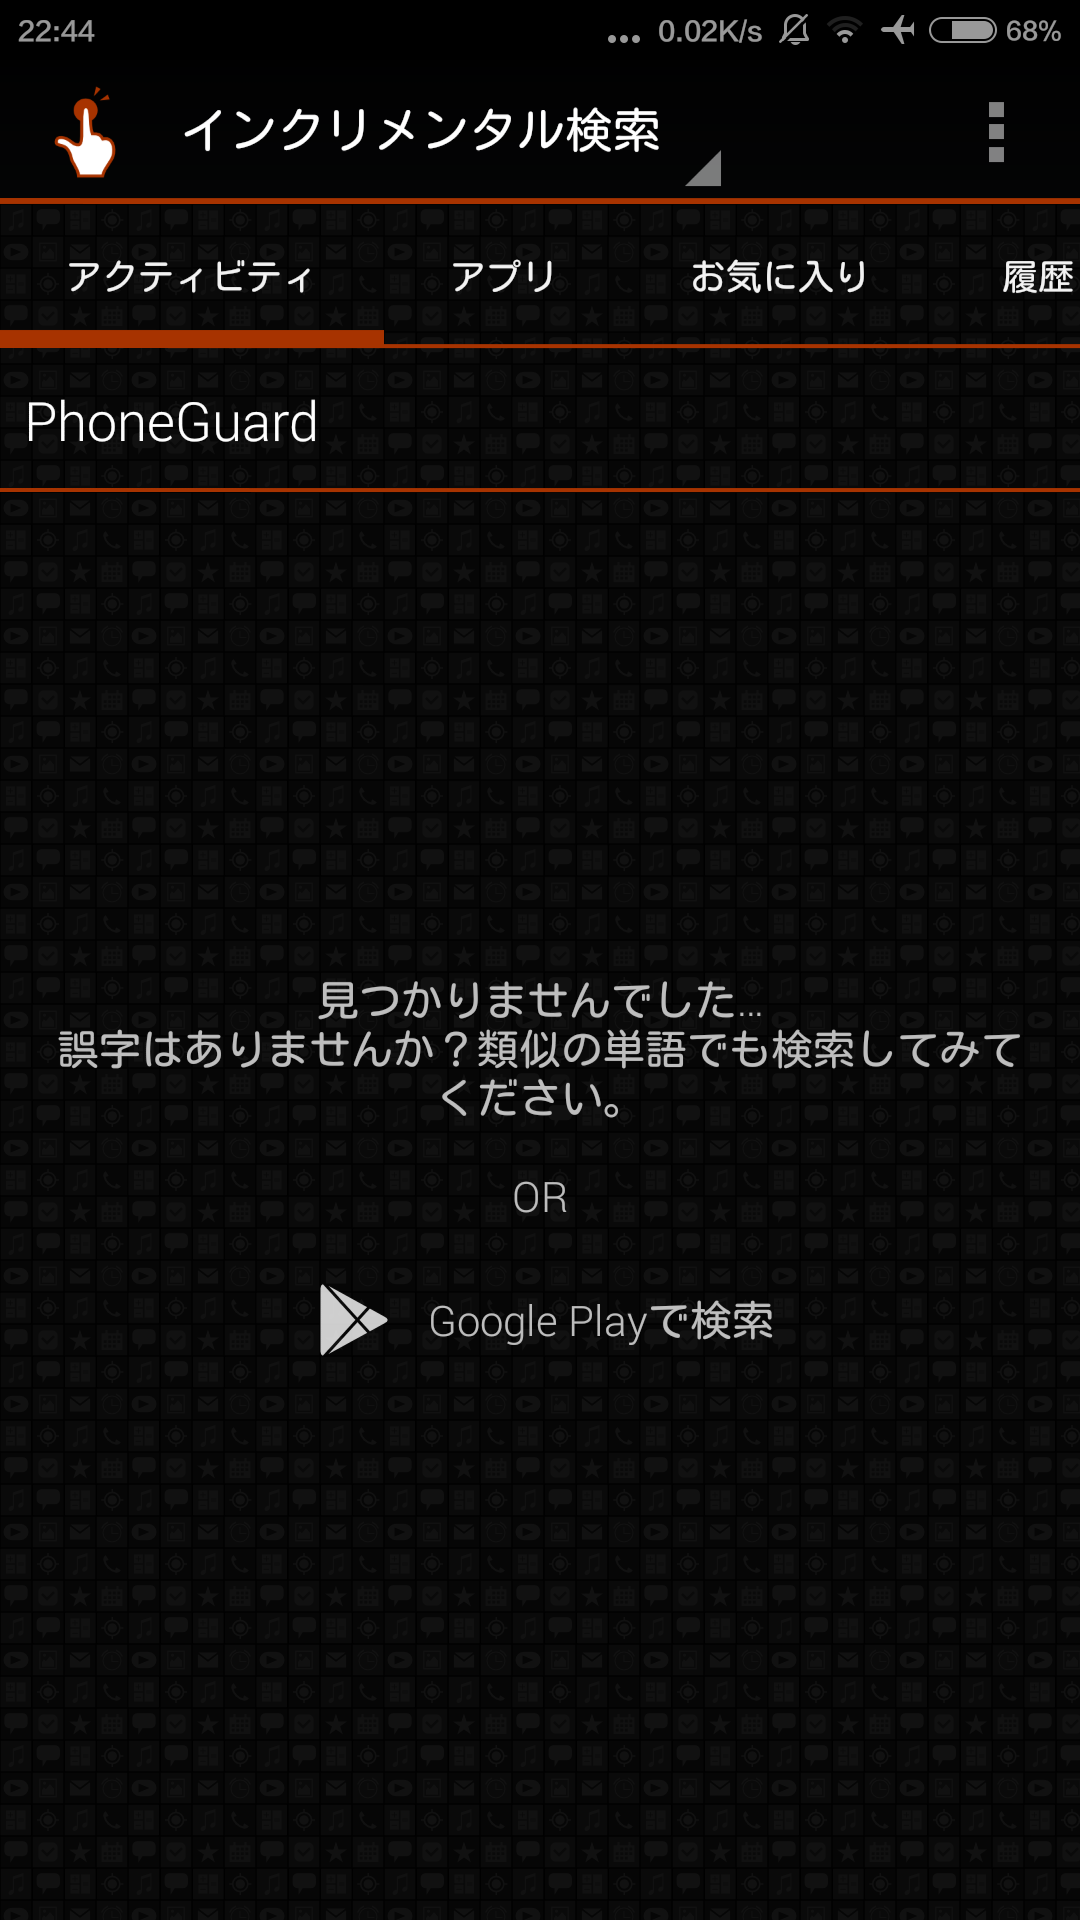 Screenshot_2015-03-09-22-44-13.png